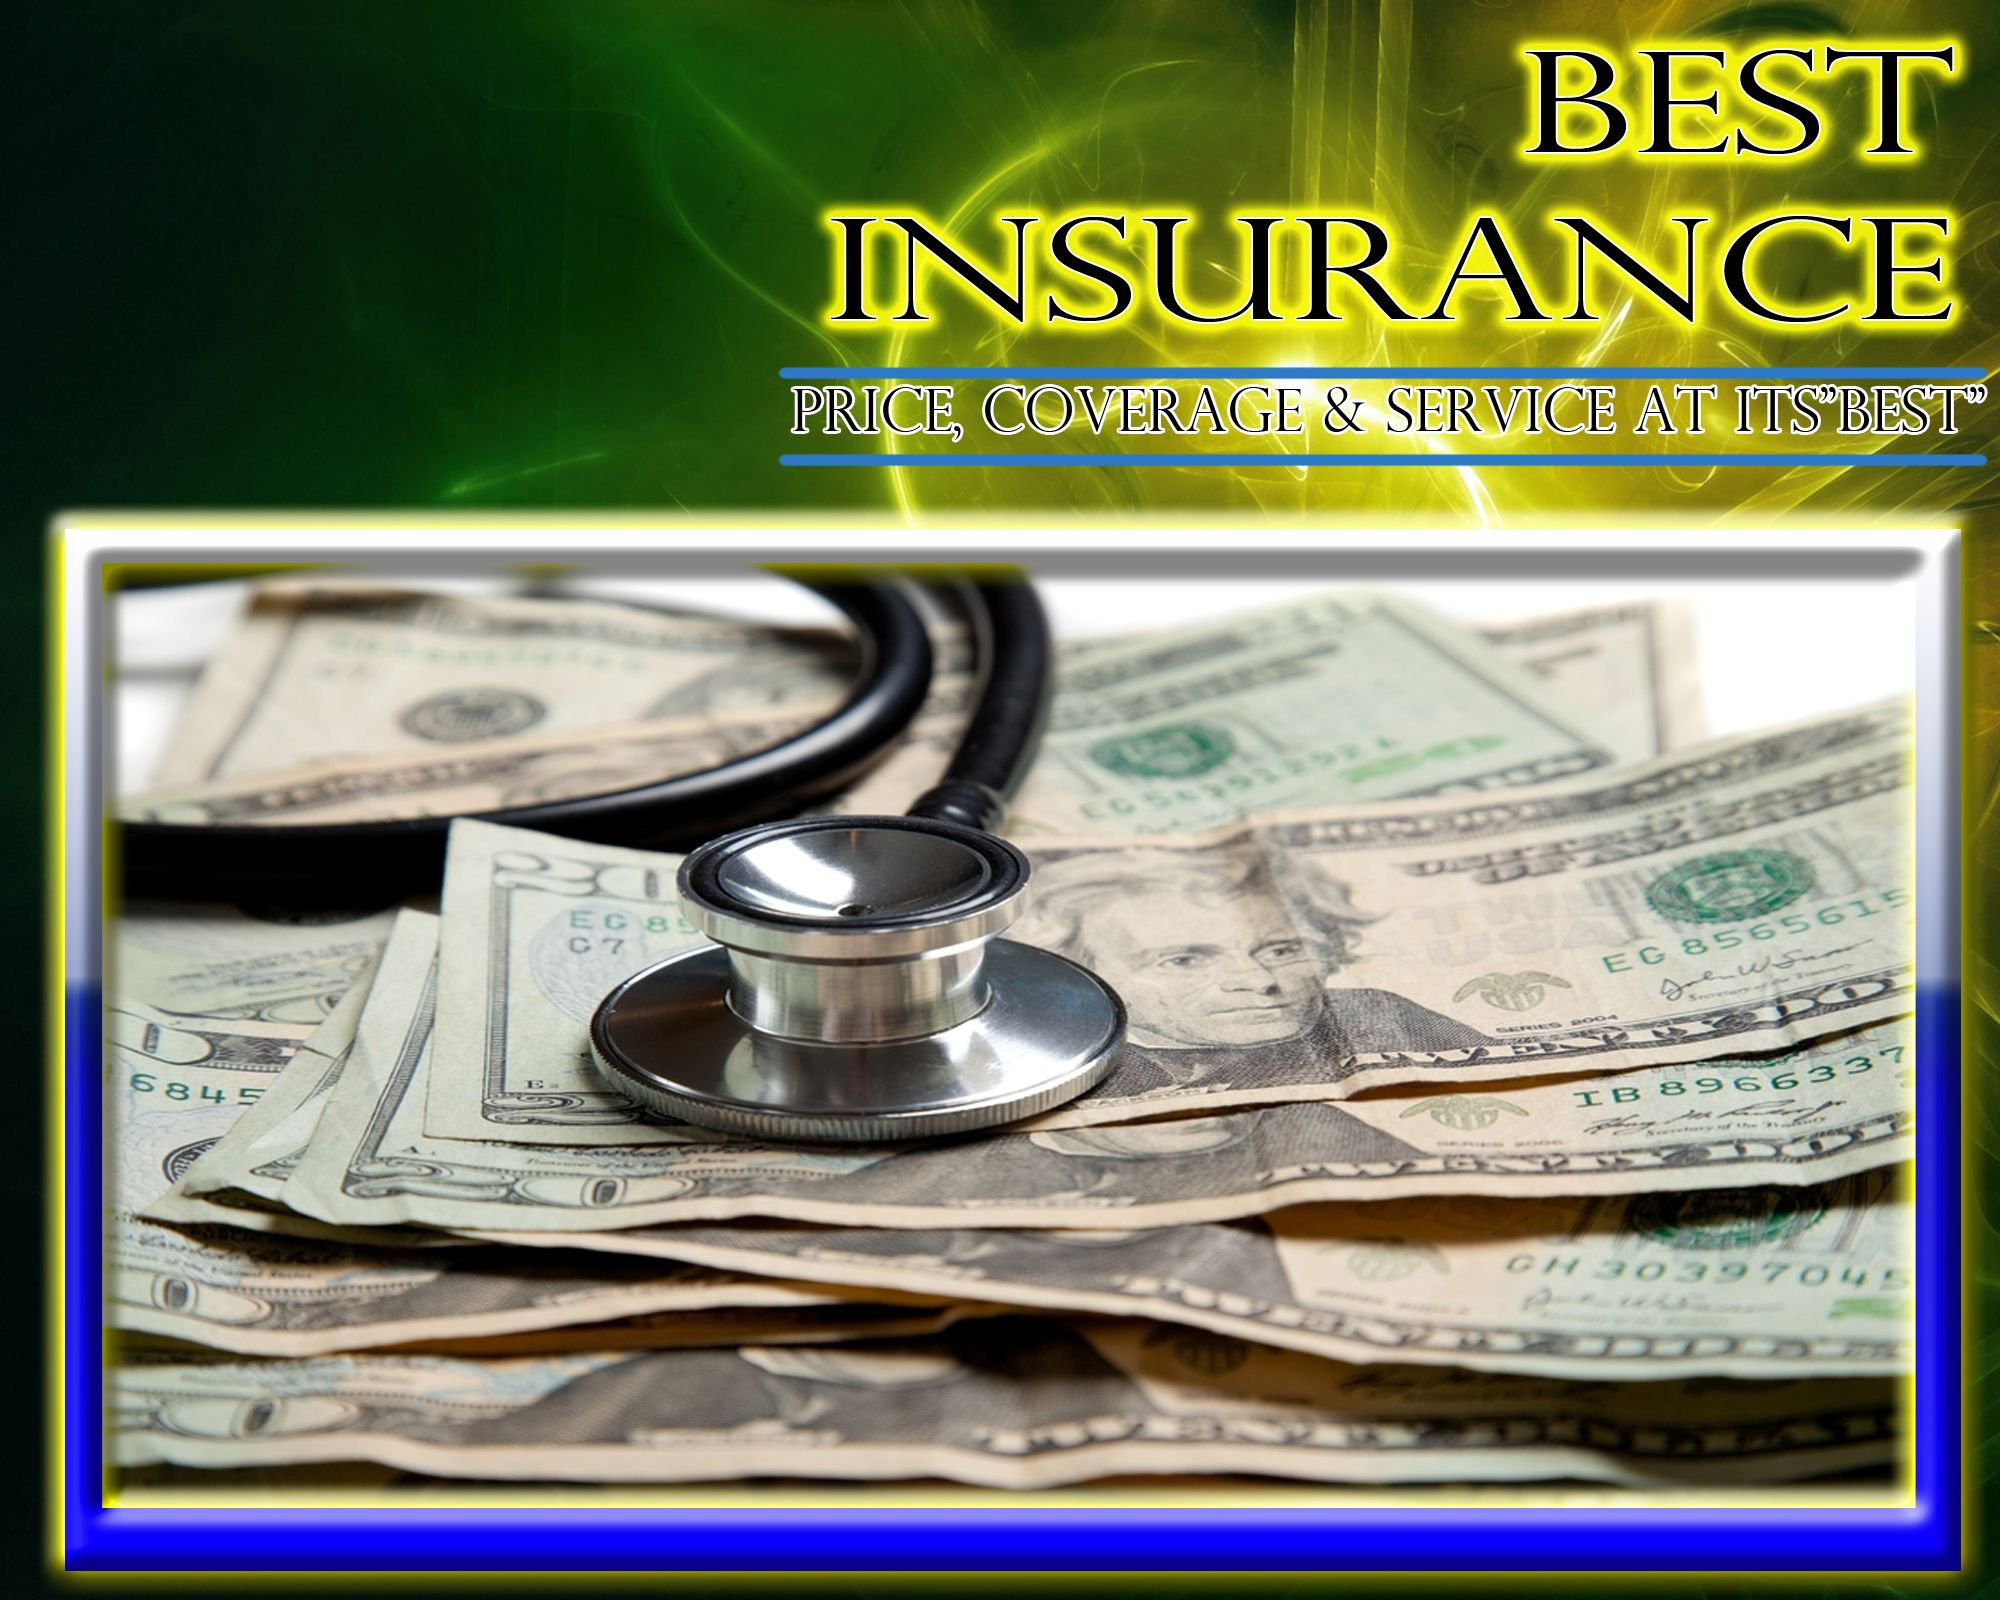 Homeownersinsuranceftlauderdale money and insurance